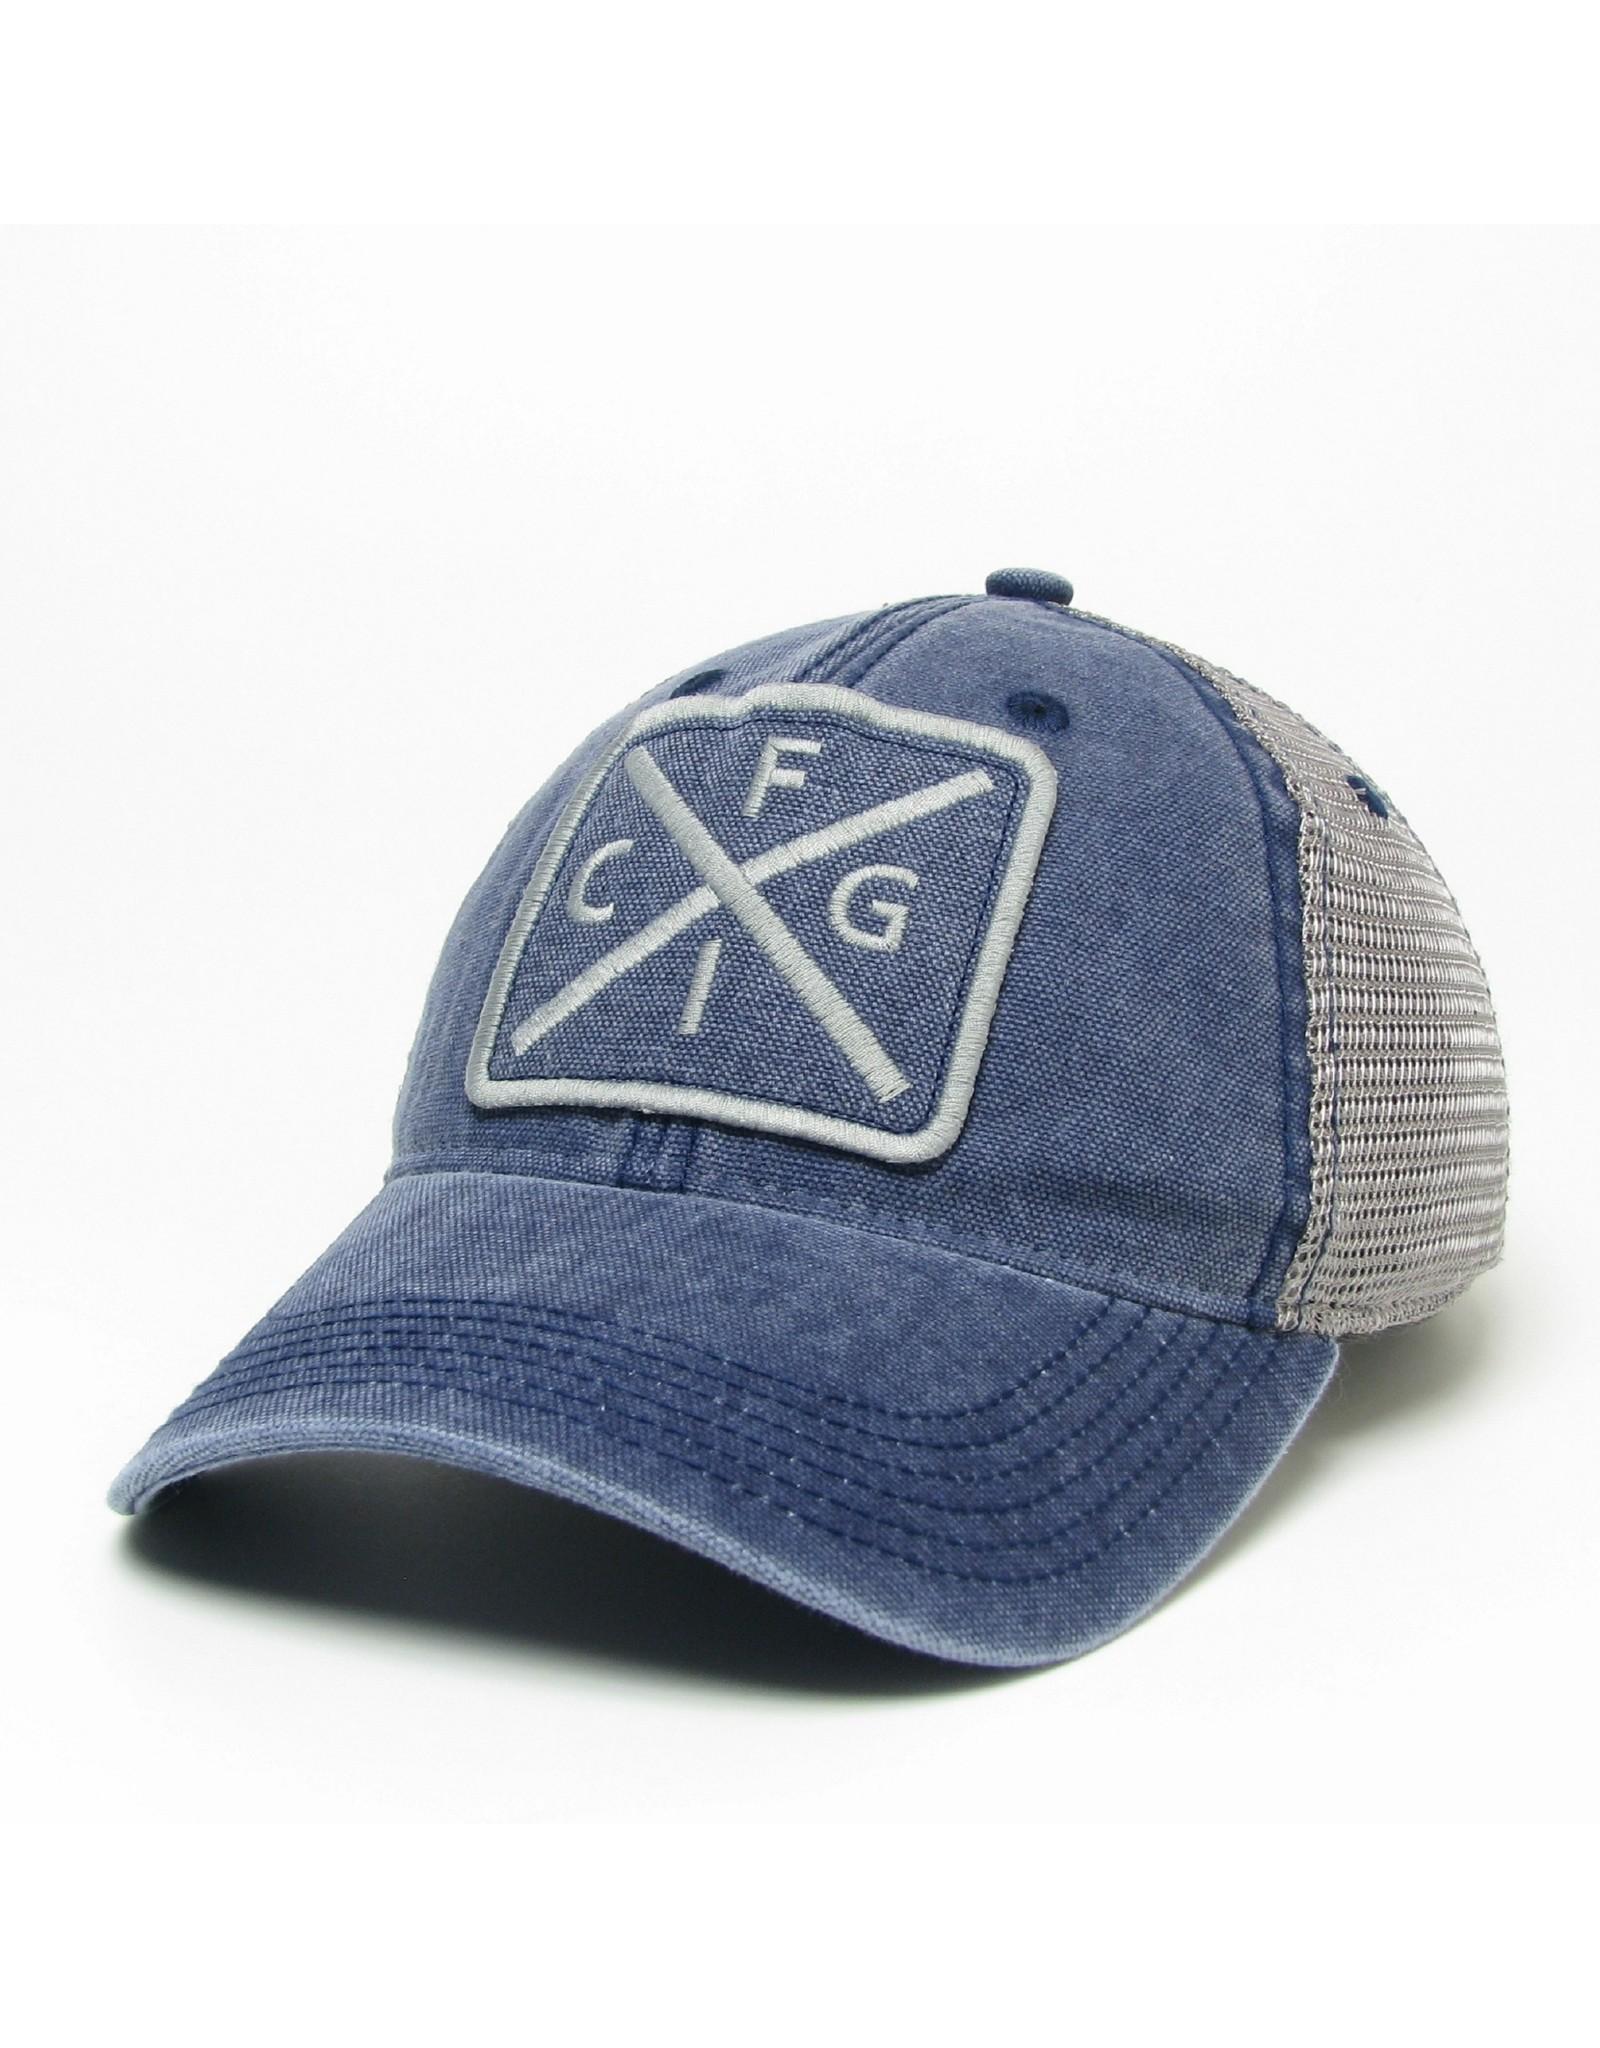 L2 Brands CGFI Blue Trucker